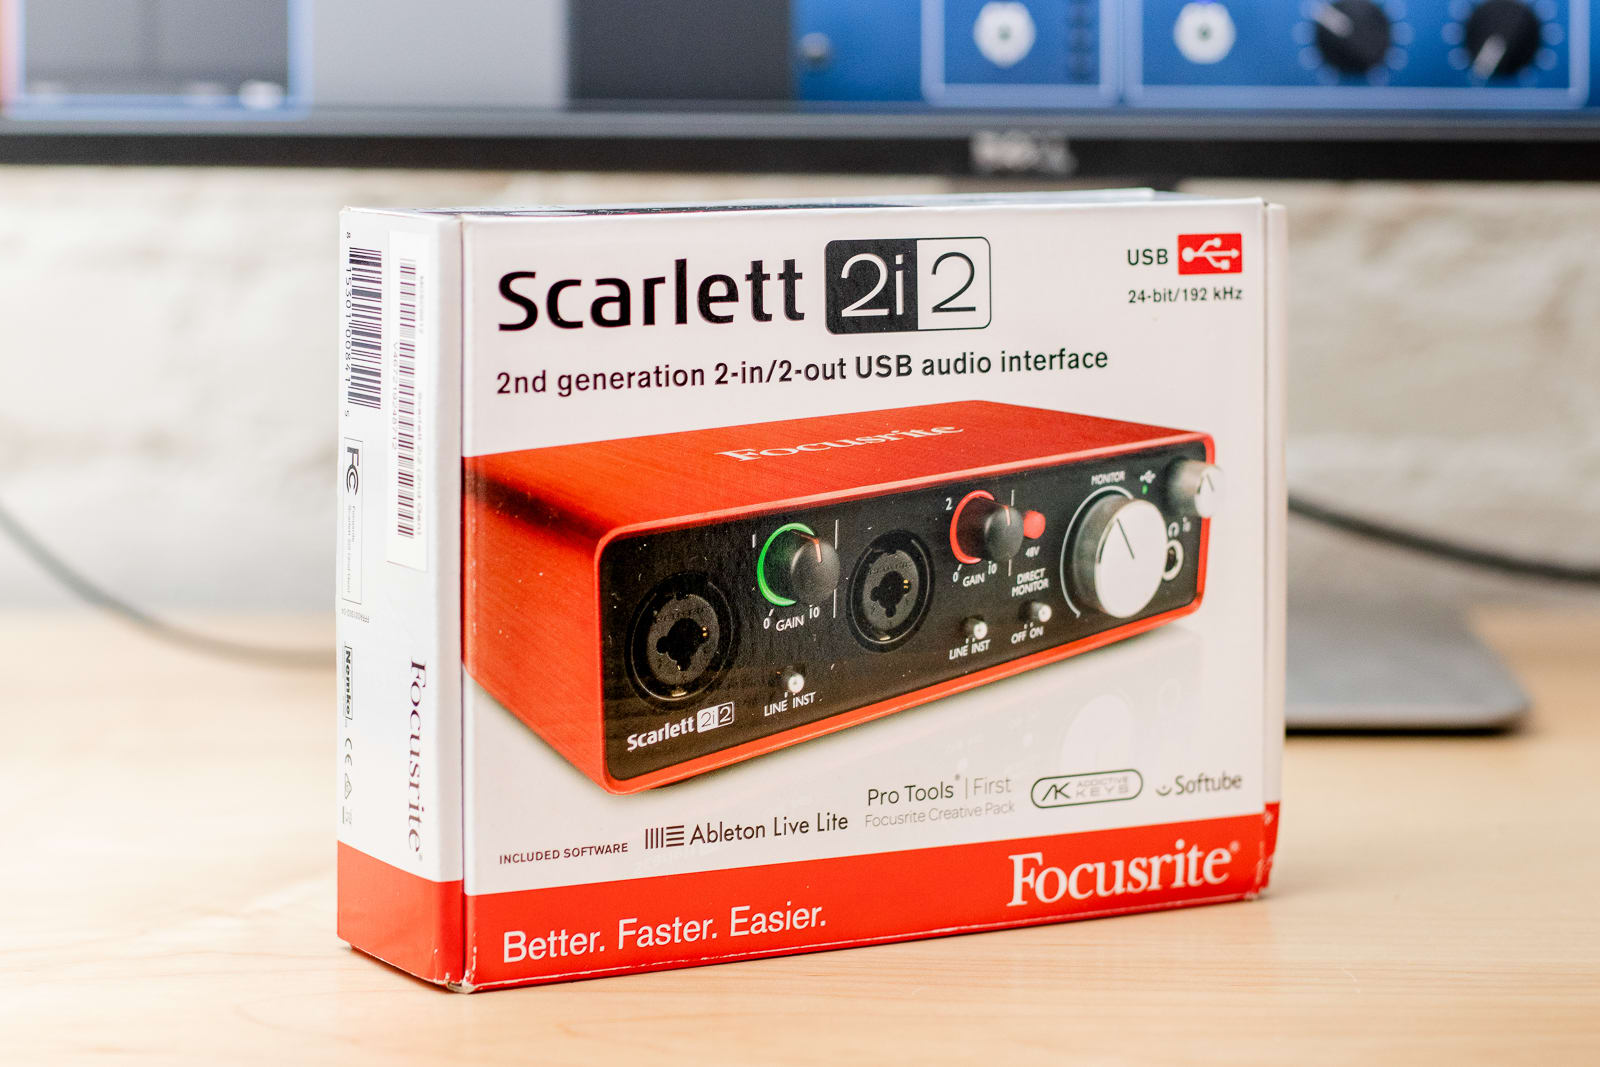 USB audio interface